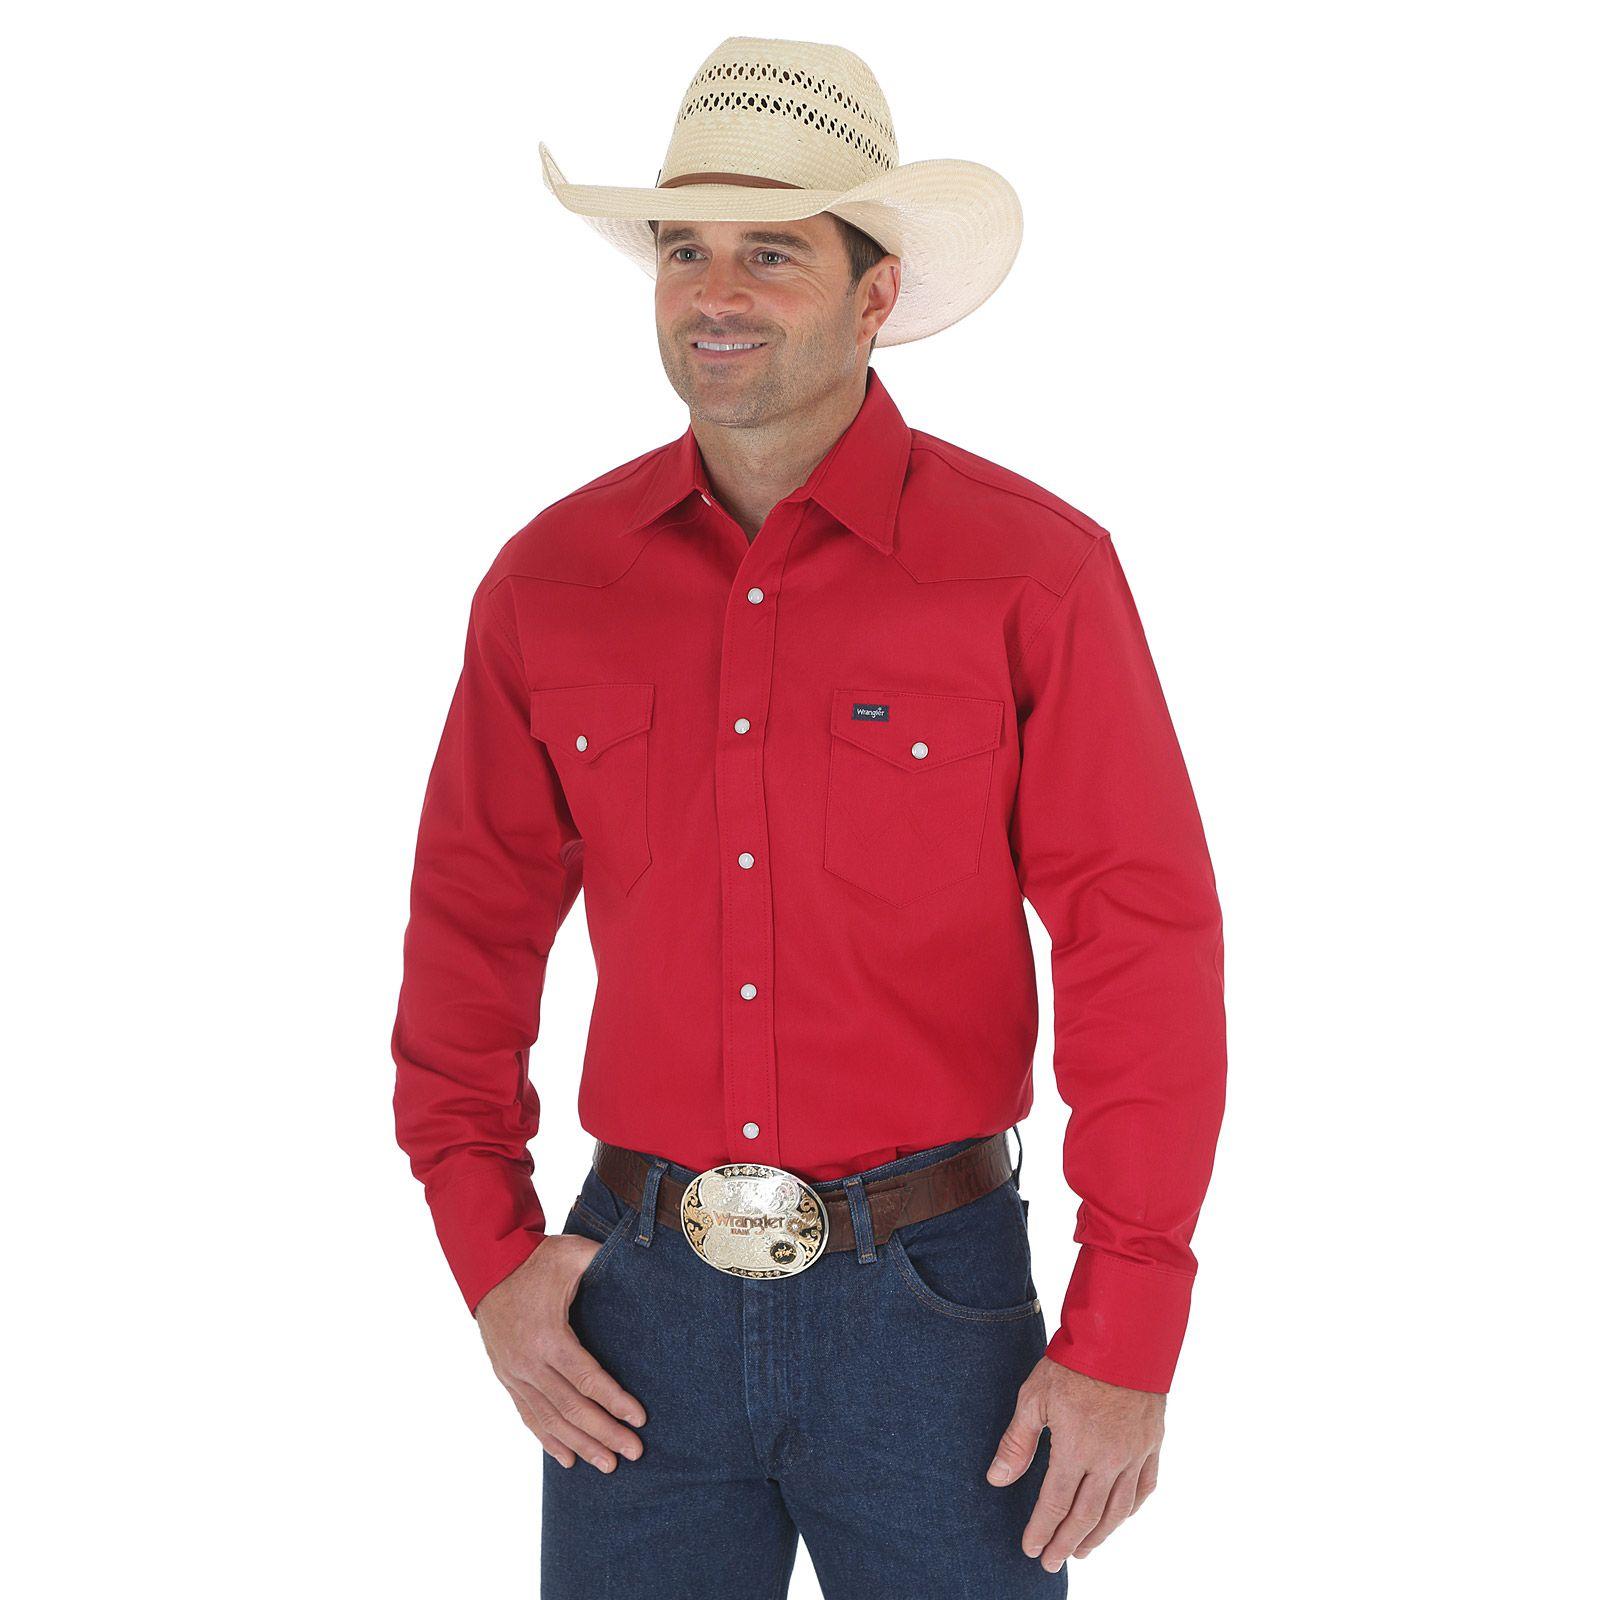 2bce7fd9 Cowboy Cut Firm Finish Twill Long Sleeve Work Western Shirt Men ...